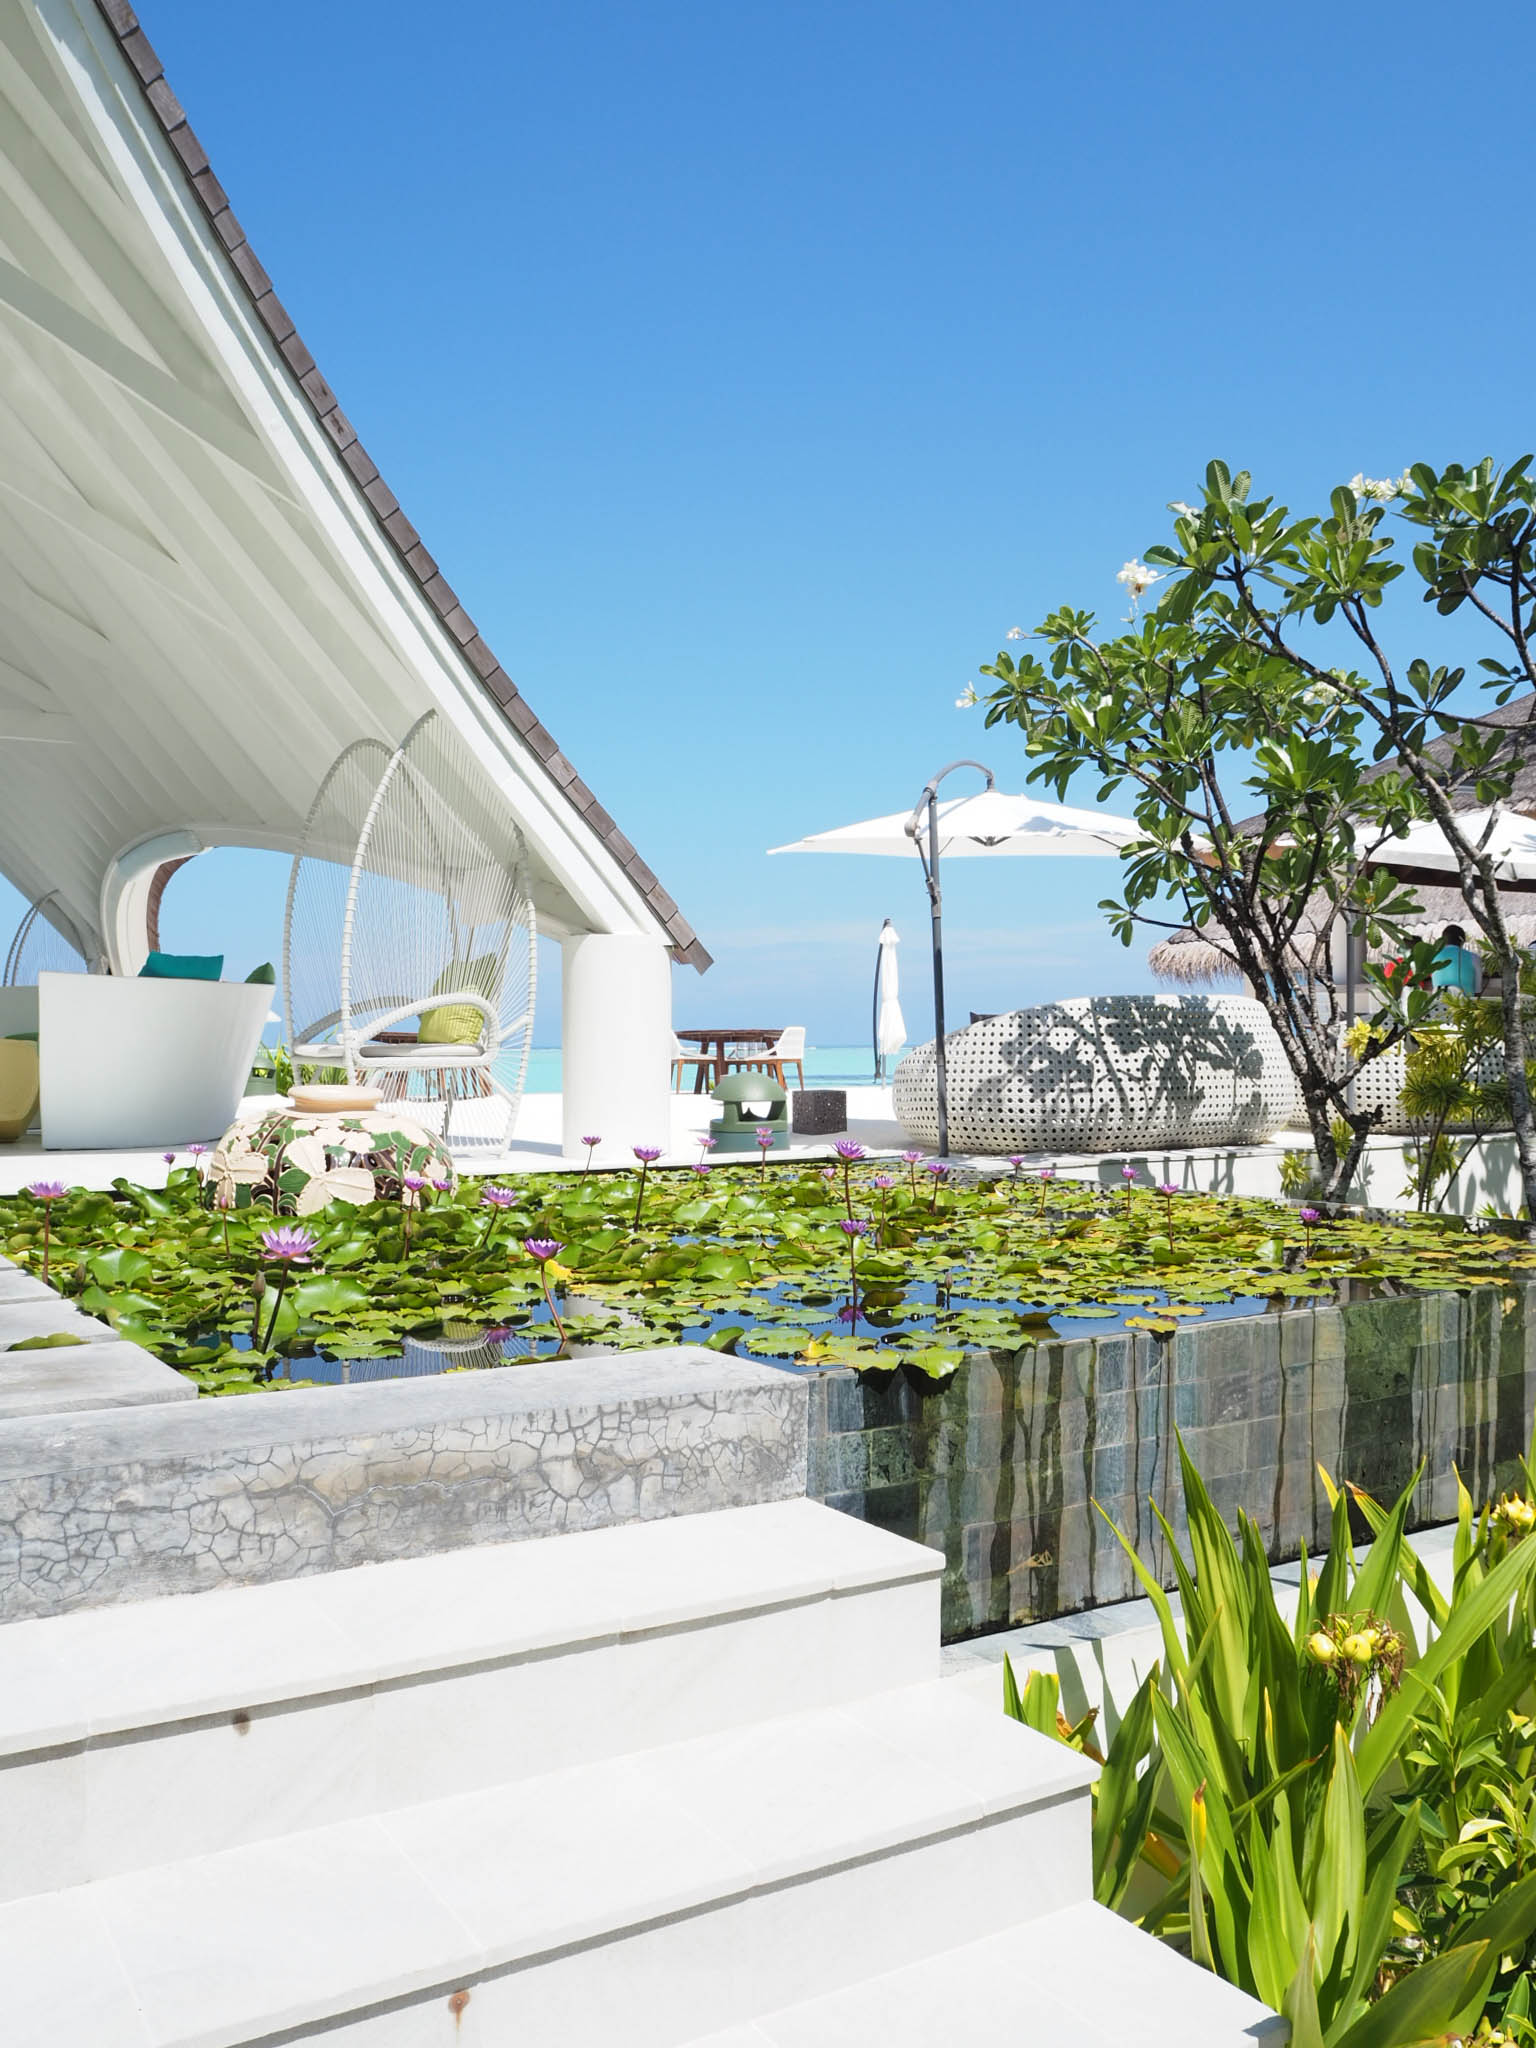 Ozen by Atmosphere resort, Maldives